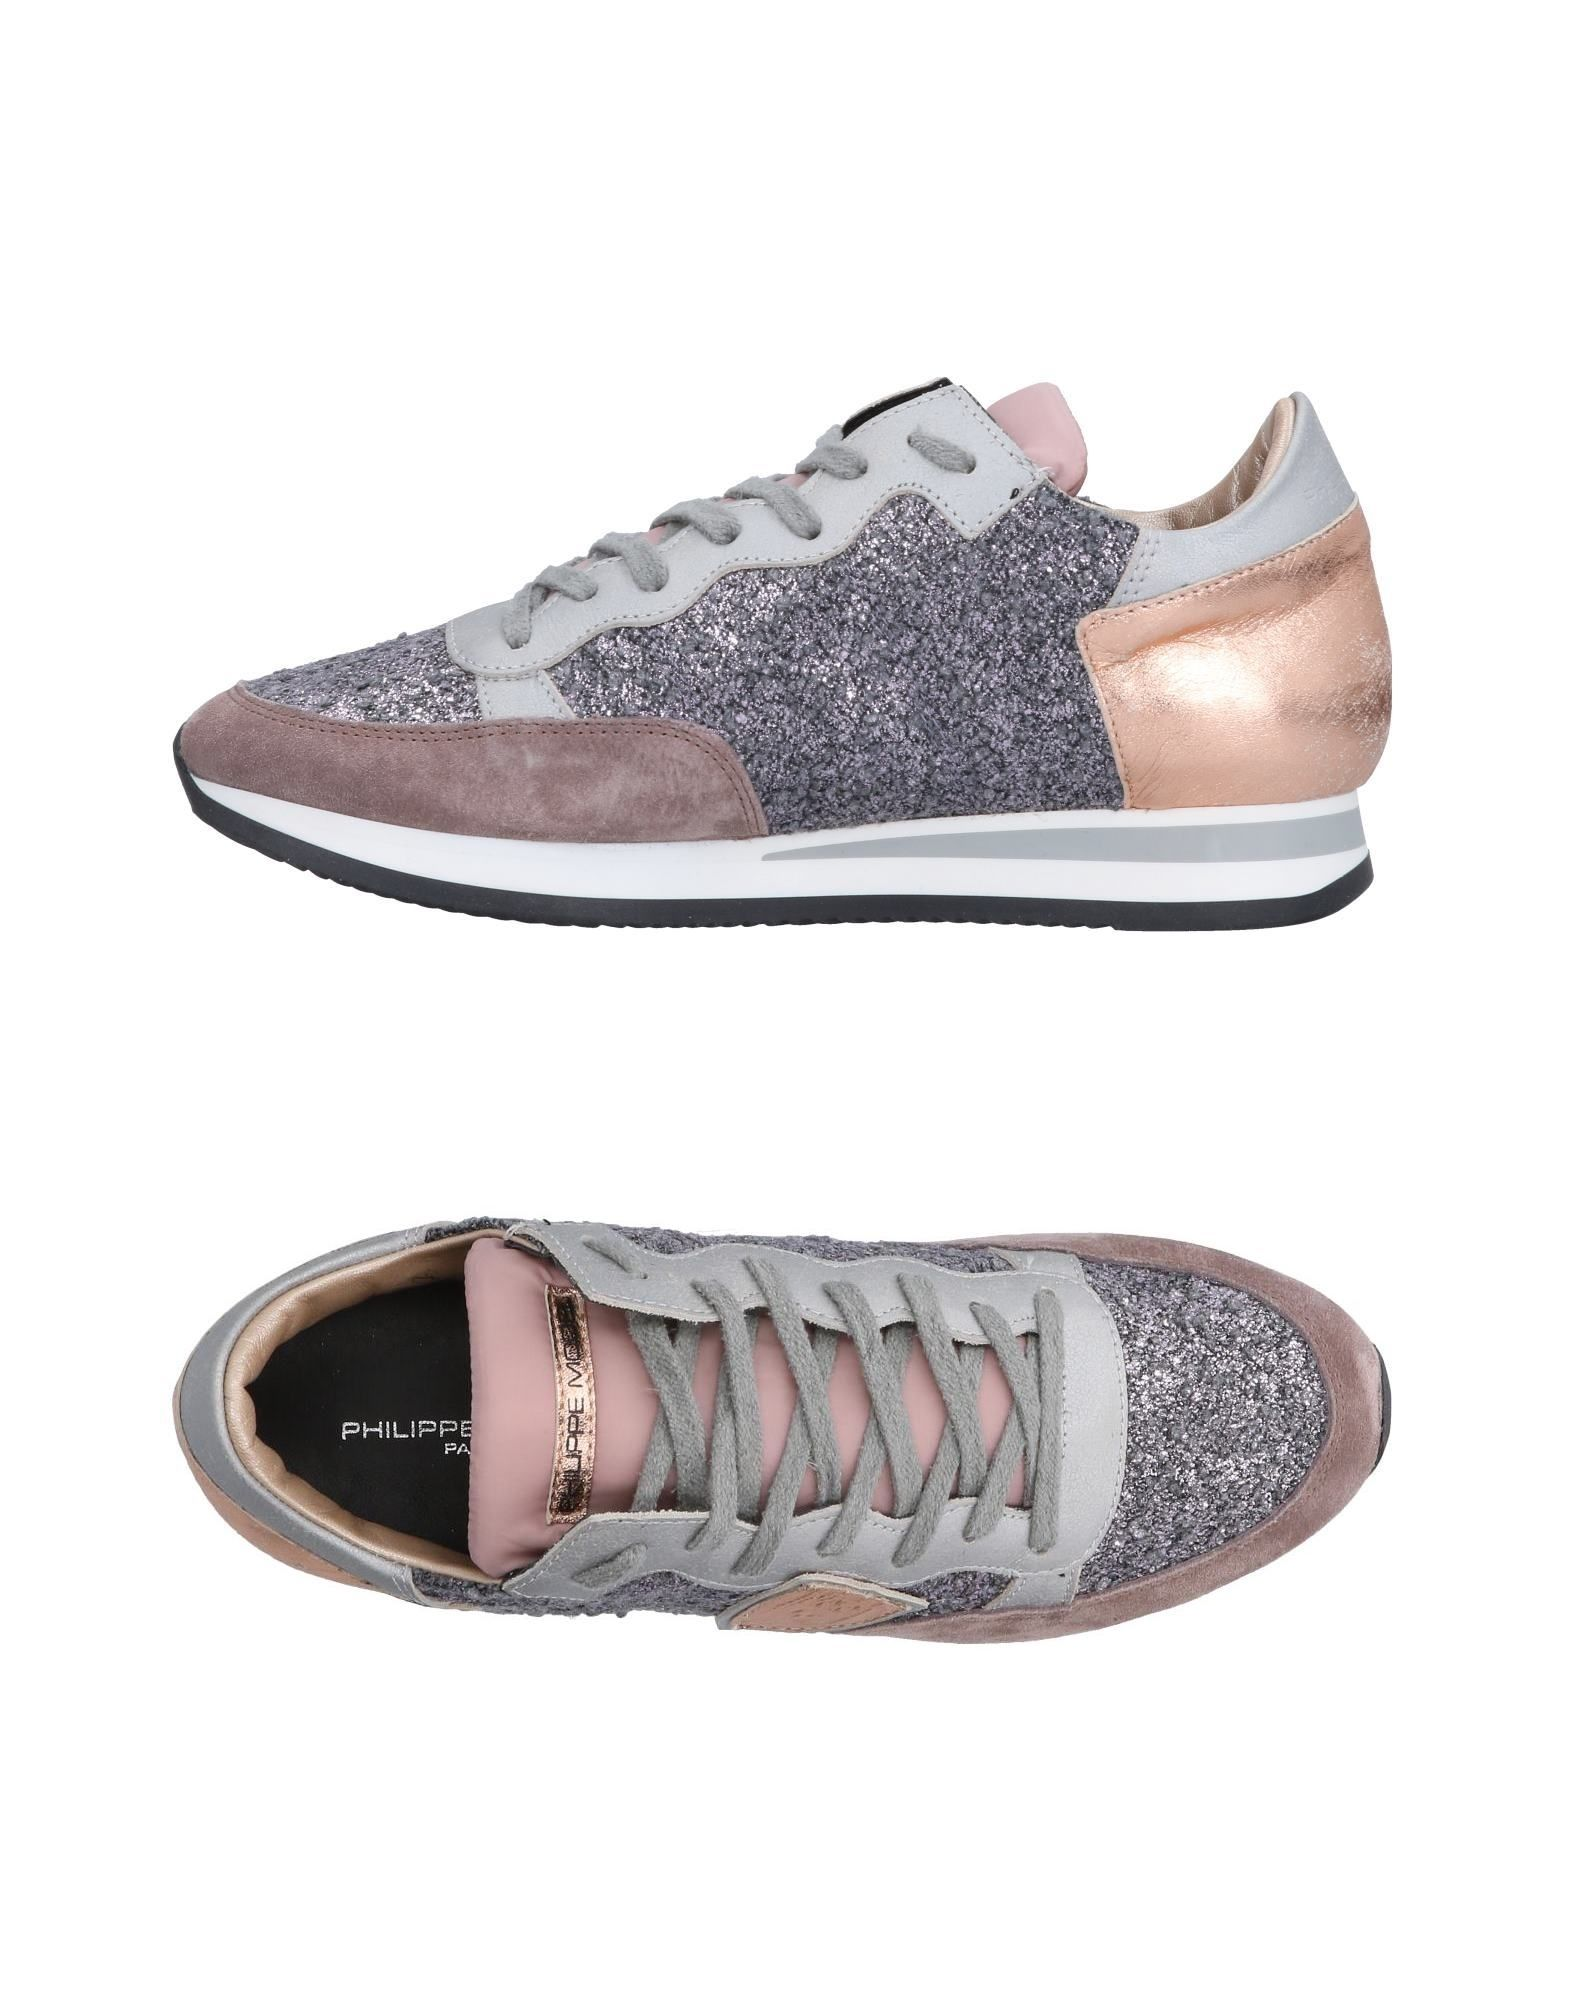 Philippe Model Sneakers Damen  11247578MHGut aussehende strapazierfähige Schuhe